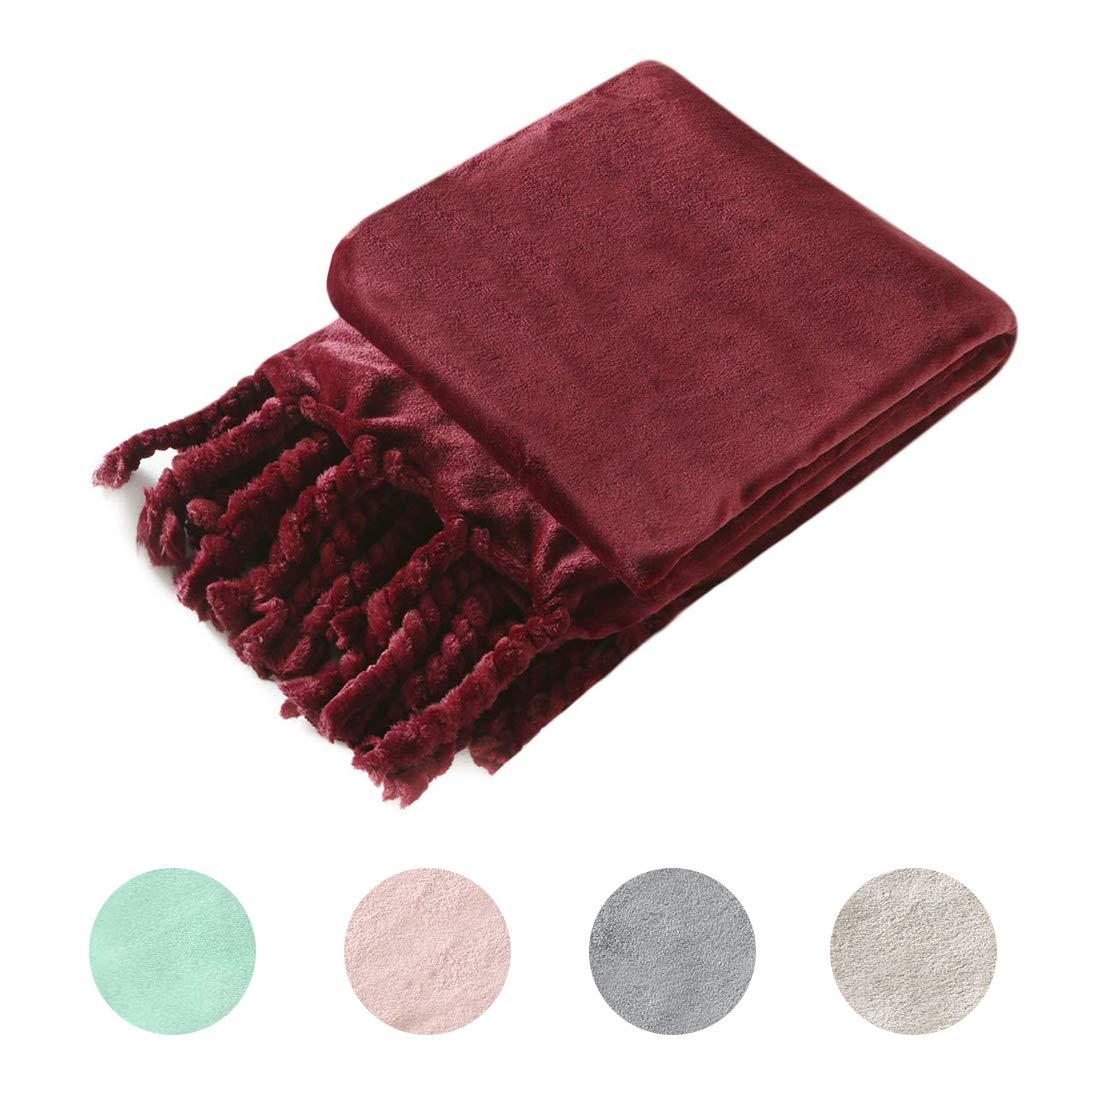 Homiest Luxury Flannel Fleece Throw Blanket for Couch Sofa Lightweight Soft & Cozy Velvet Throw Blanket with Fringe (50 x 60,Burgundy) by Homiest